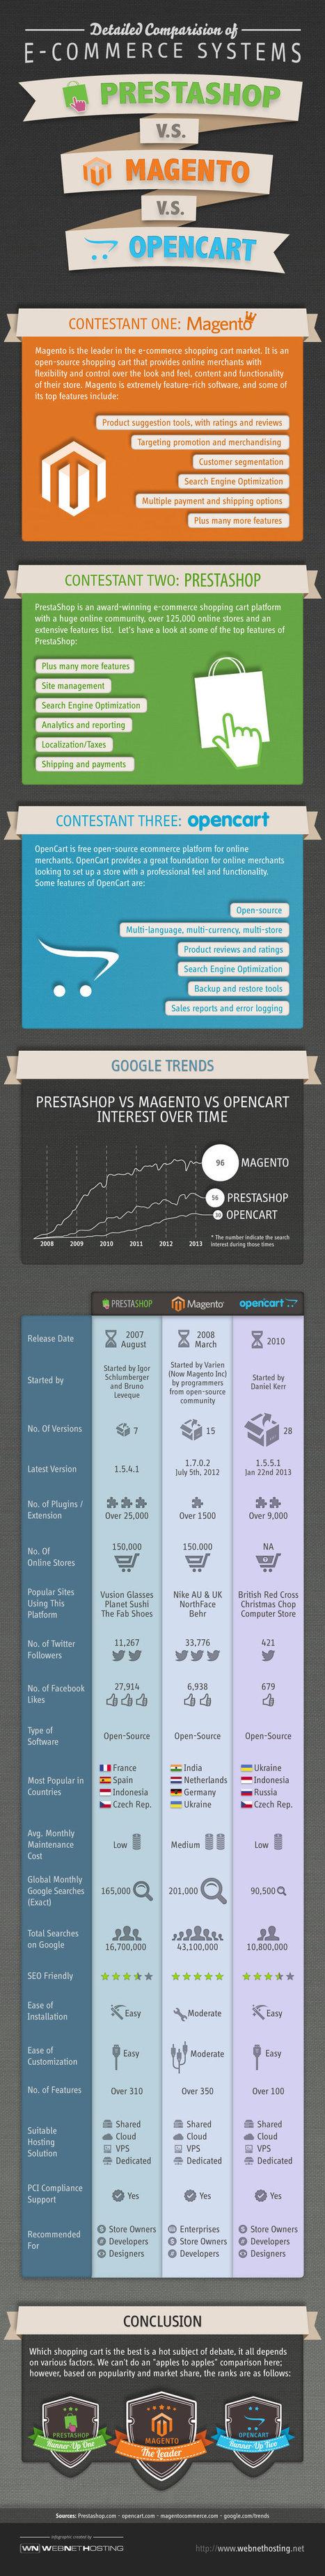 Prestashop VS Magento VS Opencart - Detailed Comparison Infographic | Digital Marketing, Social Media, and eCommerce | Scoop.it